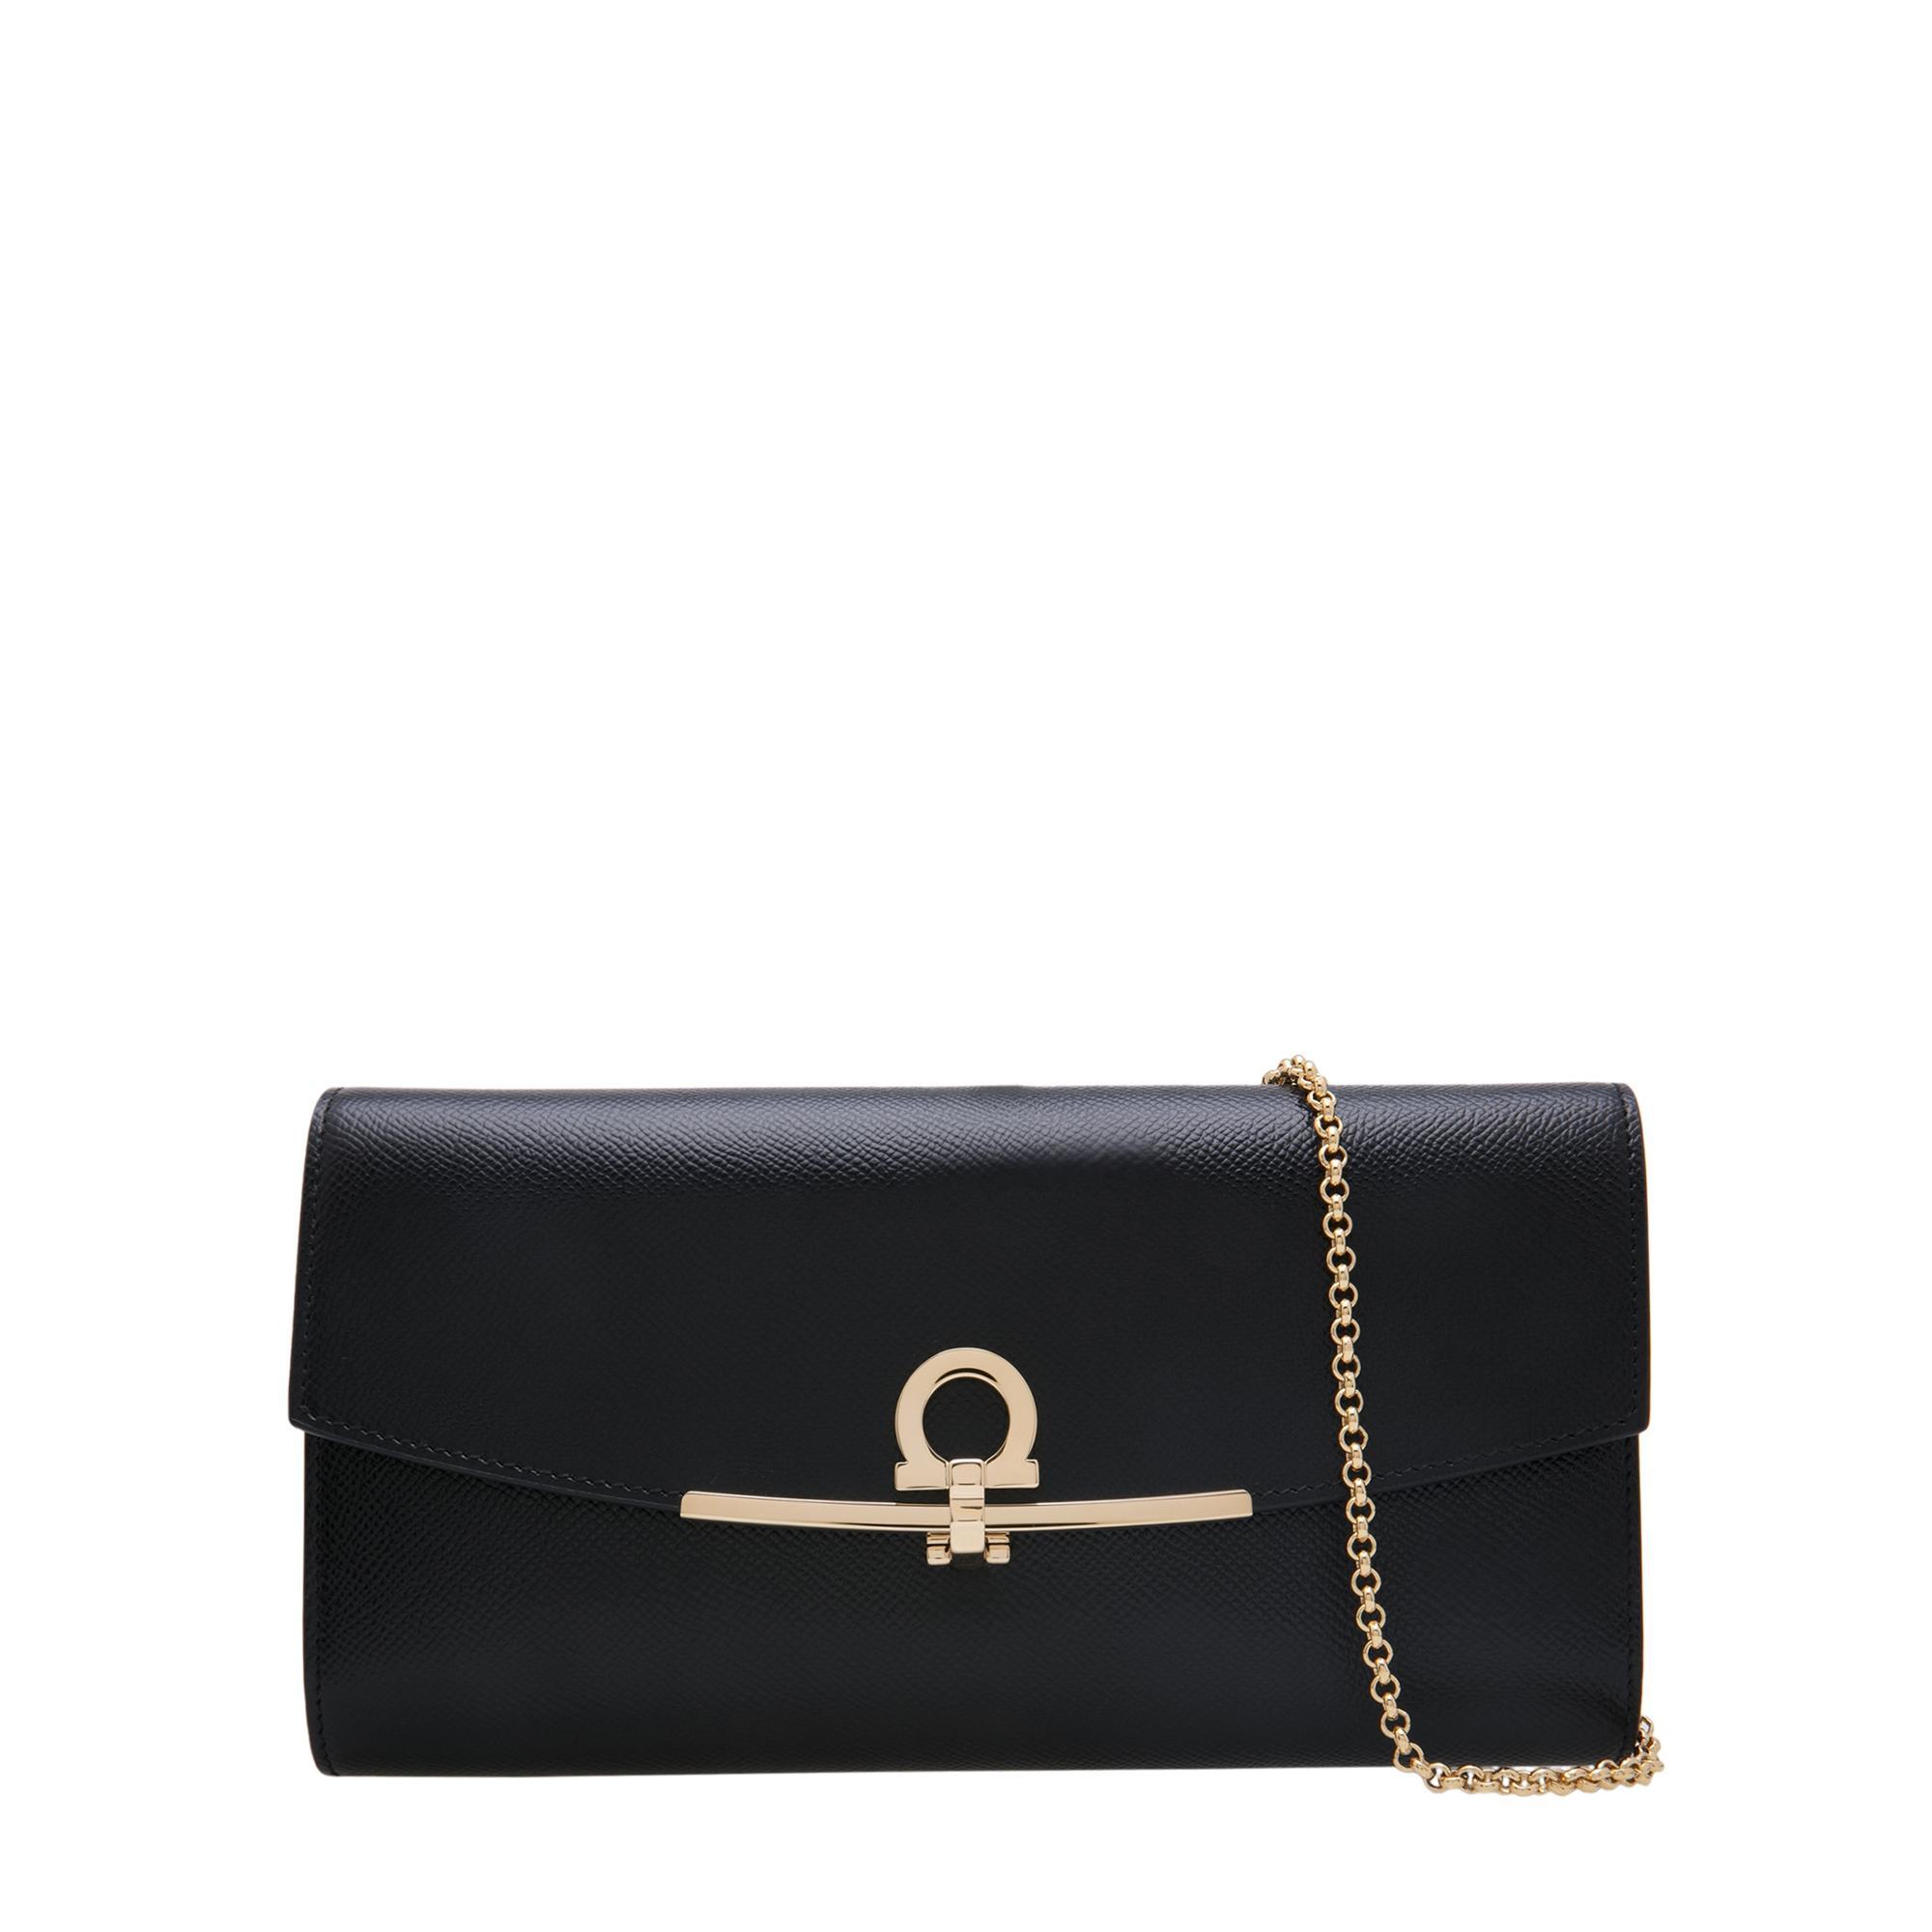 Mini Gancini bag